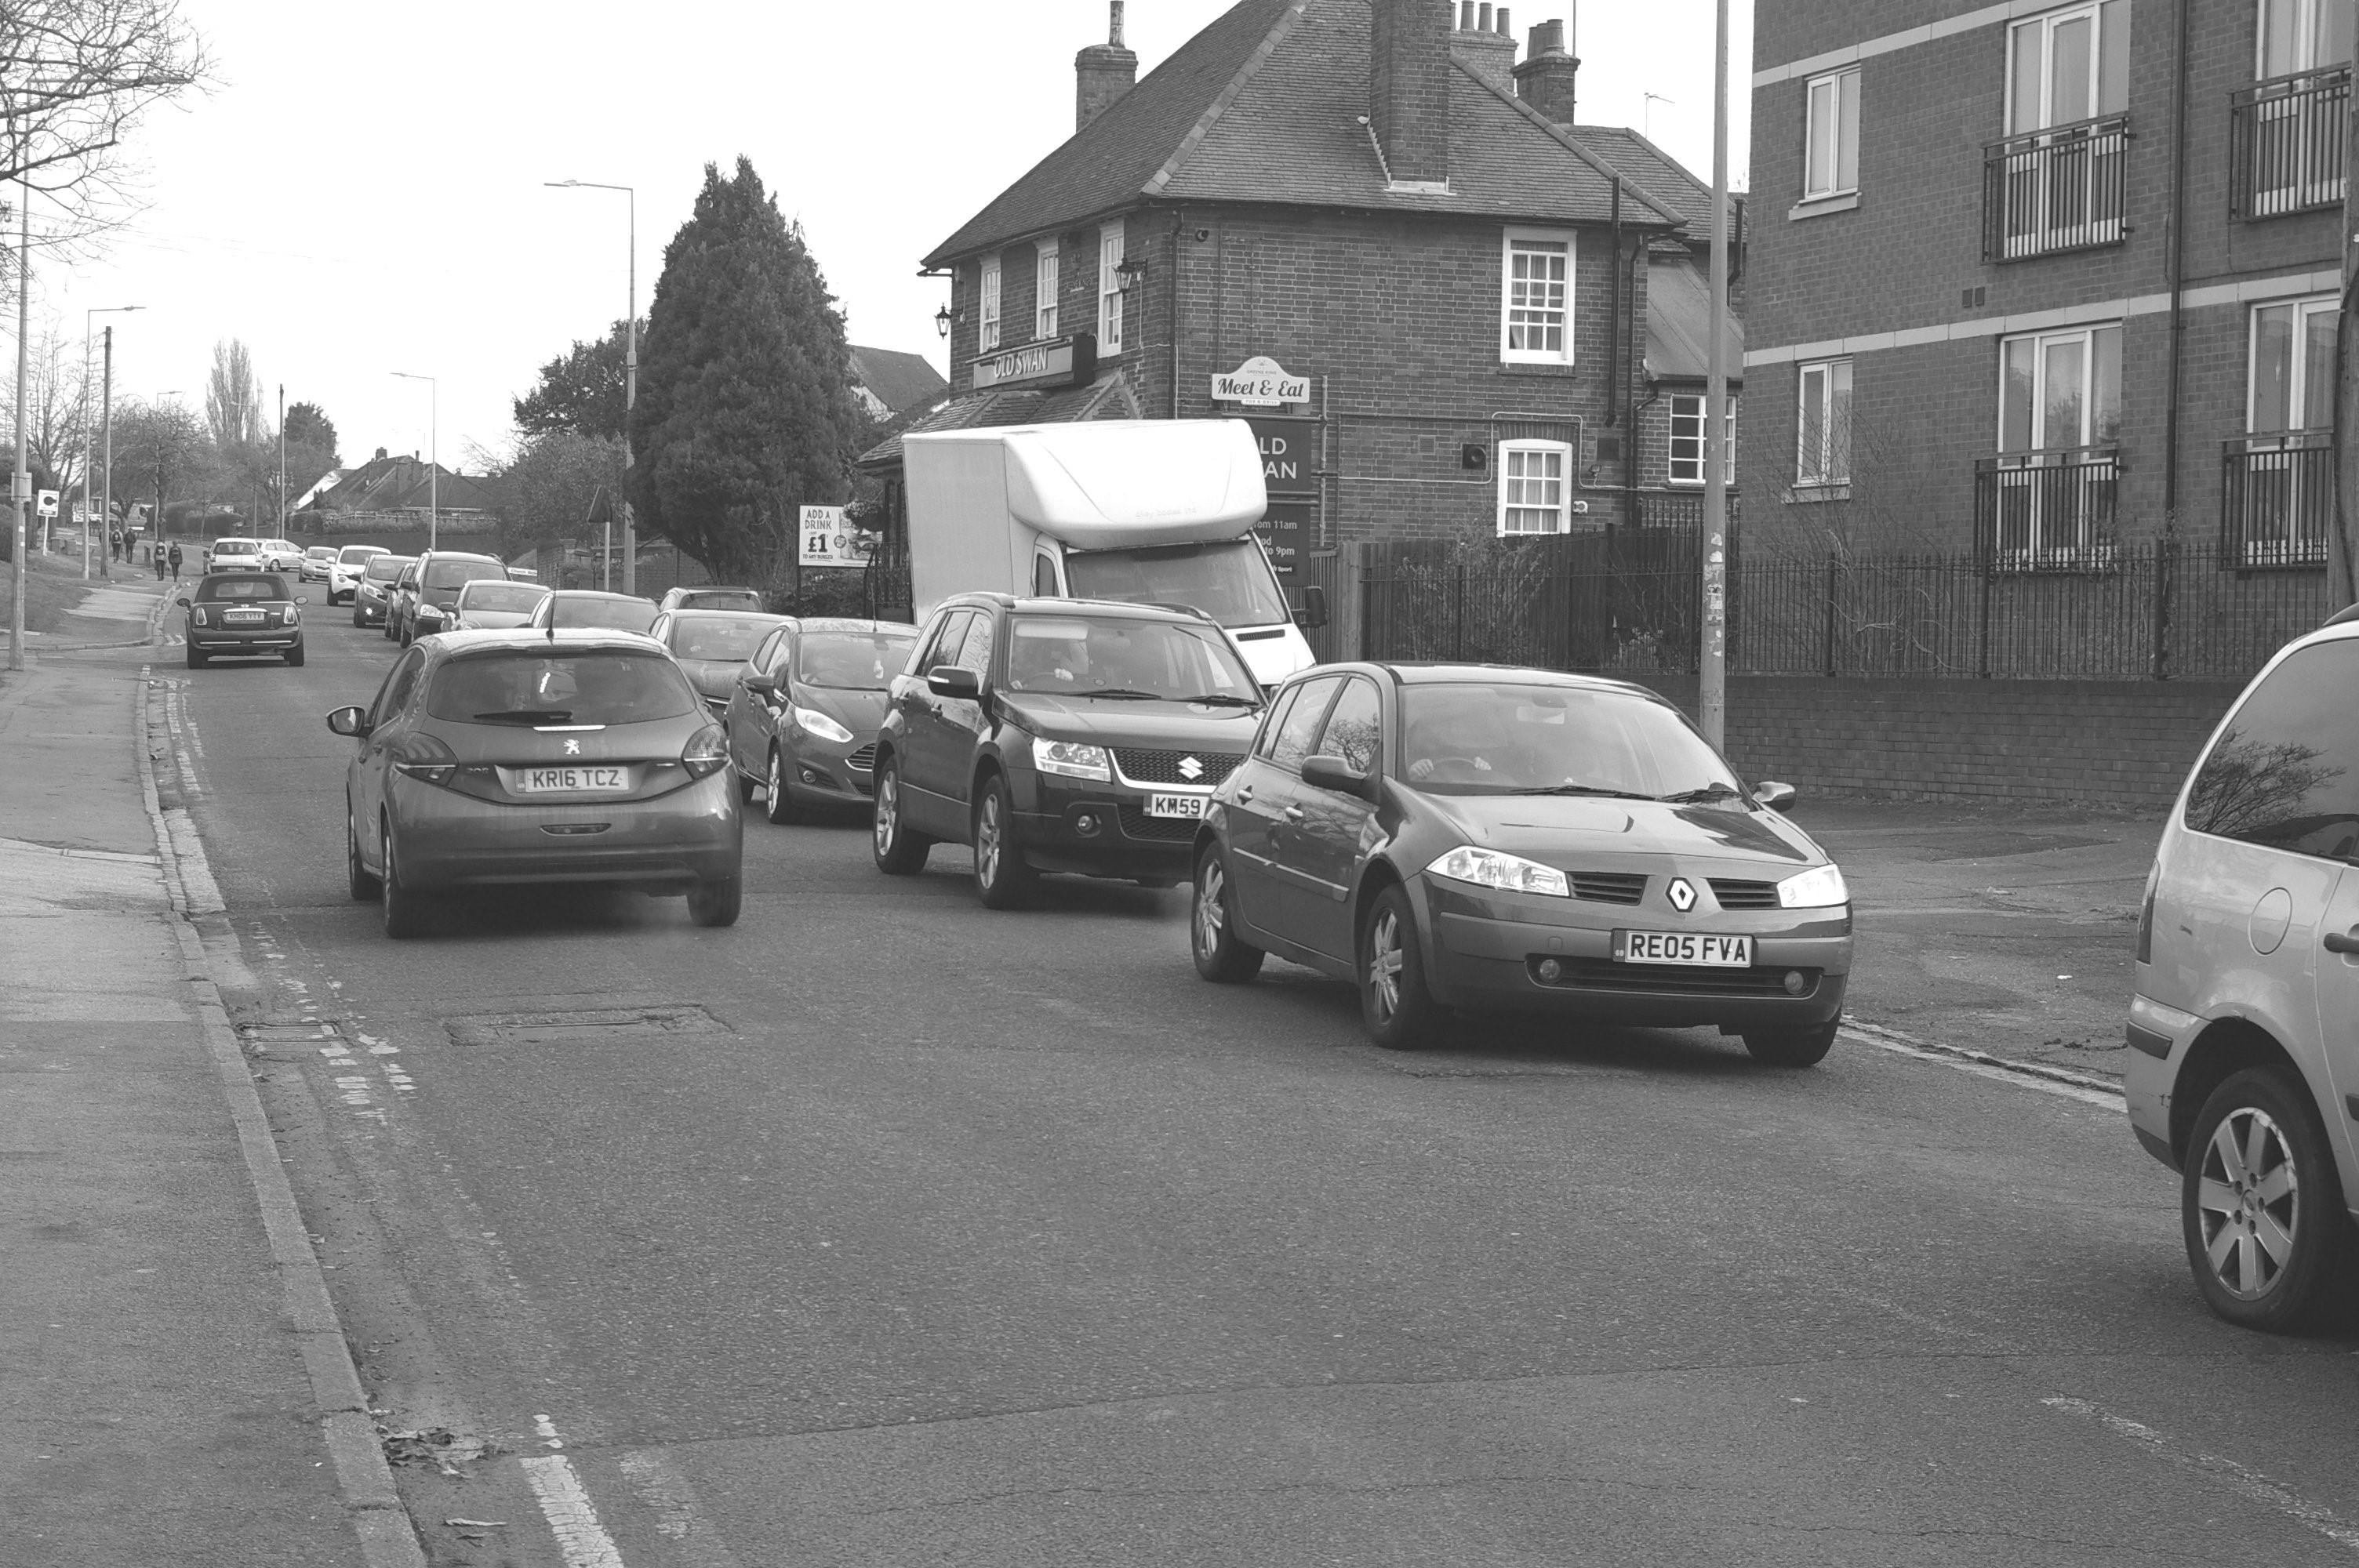 Buckingham_road.jpg